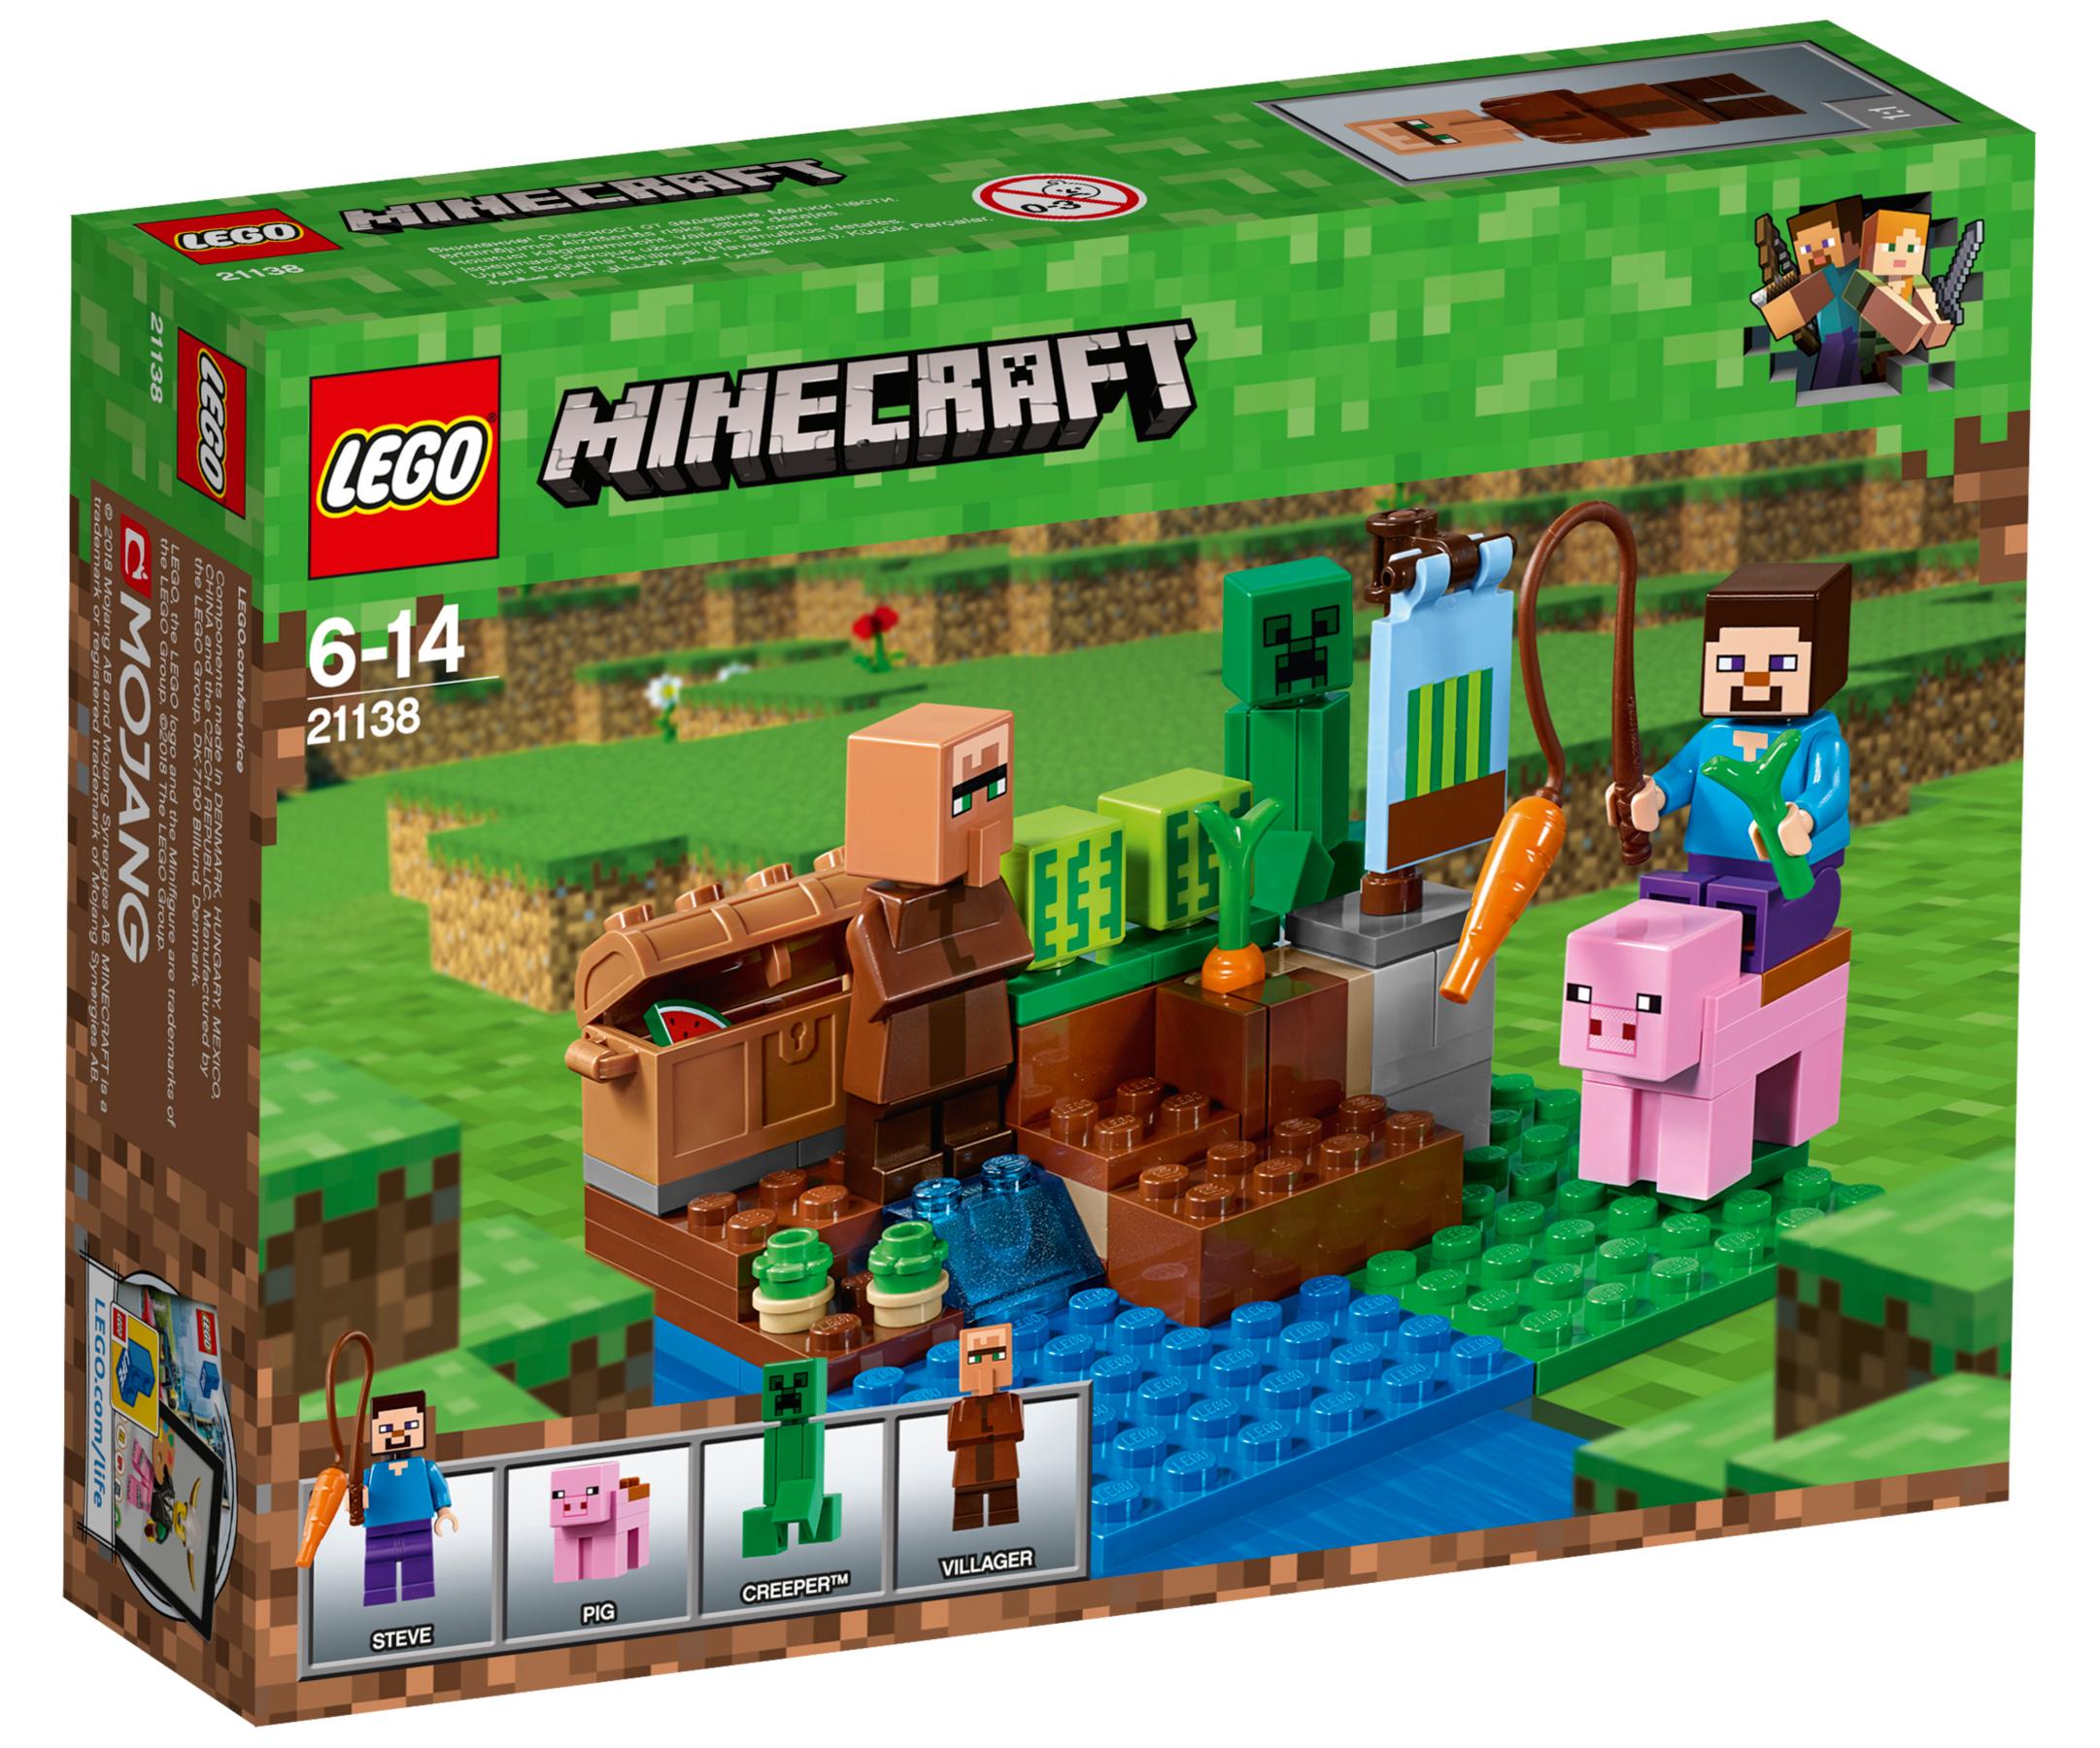 LEGO Minecraft The Melon Farm Toys & Character